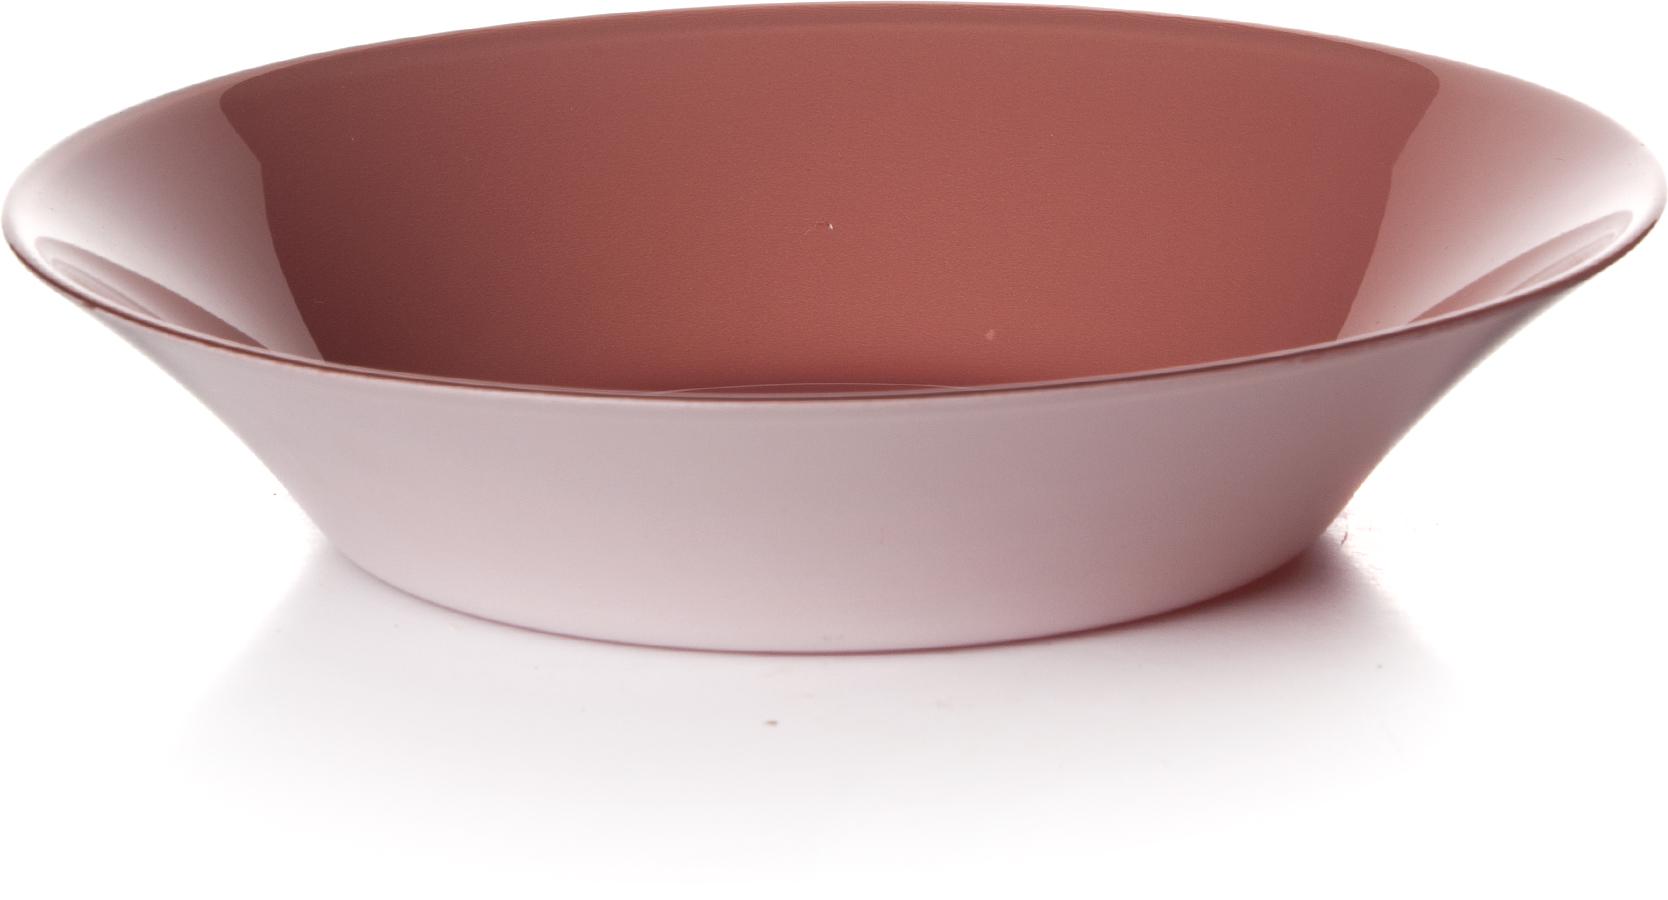 Тарелка глубокая Pasabahce Пинк сити, цвет: розовый, диаметр 22 см10335SLBD40Тарелка упрочненная глубокая 220 мл